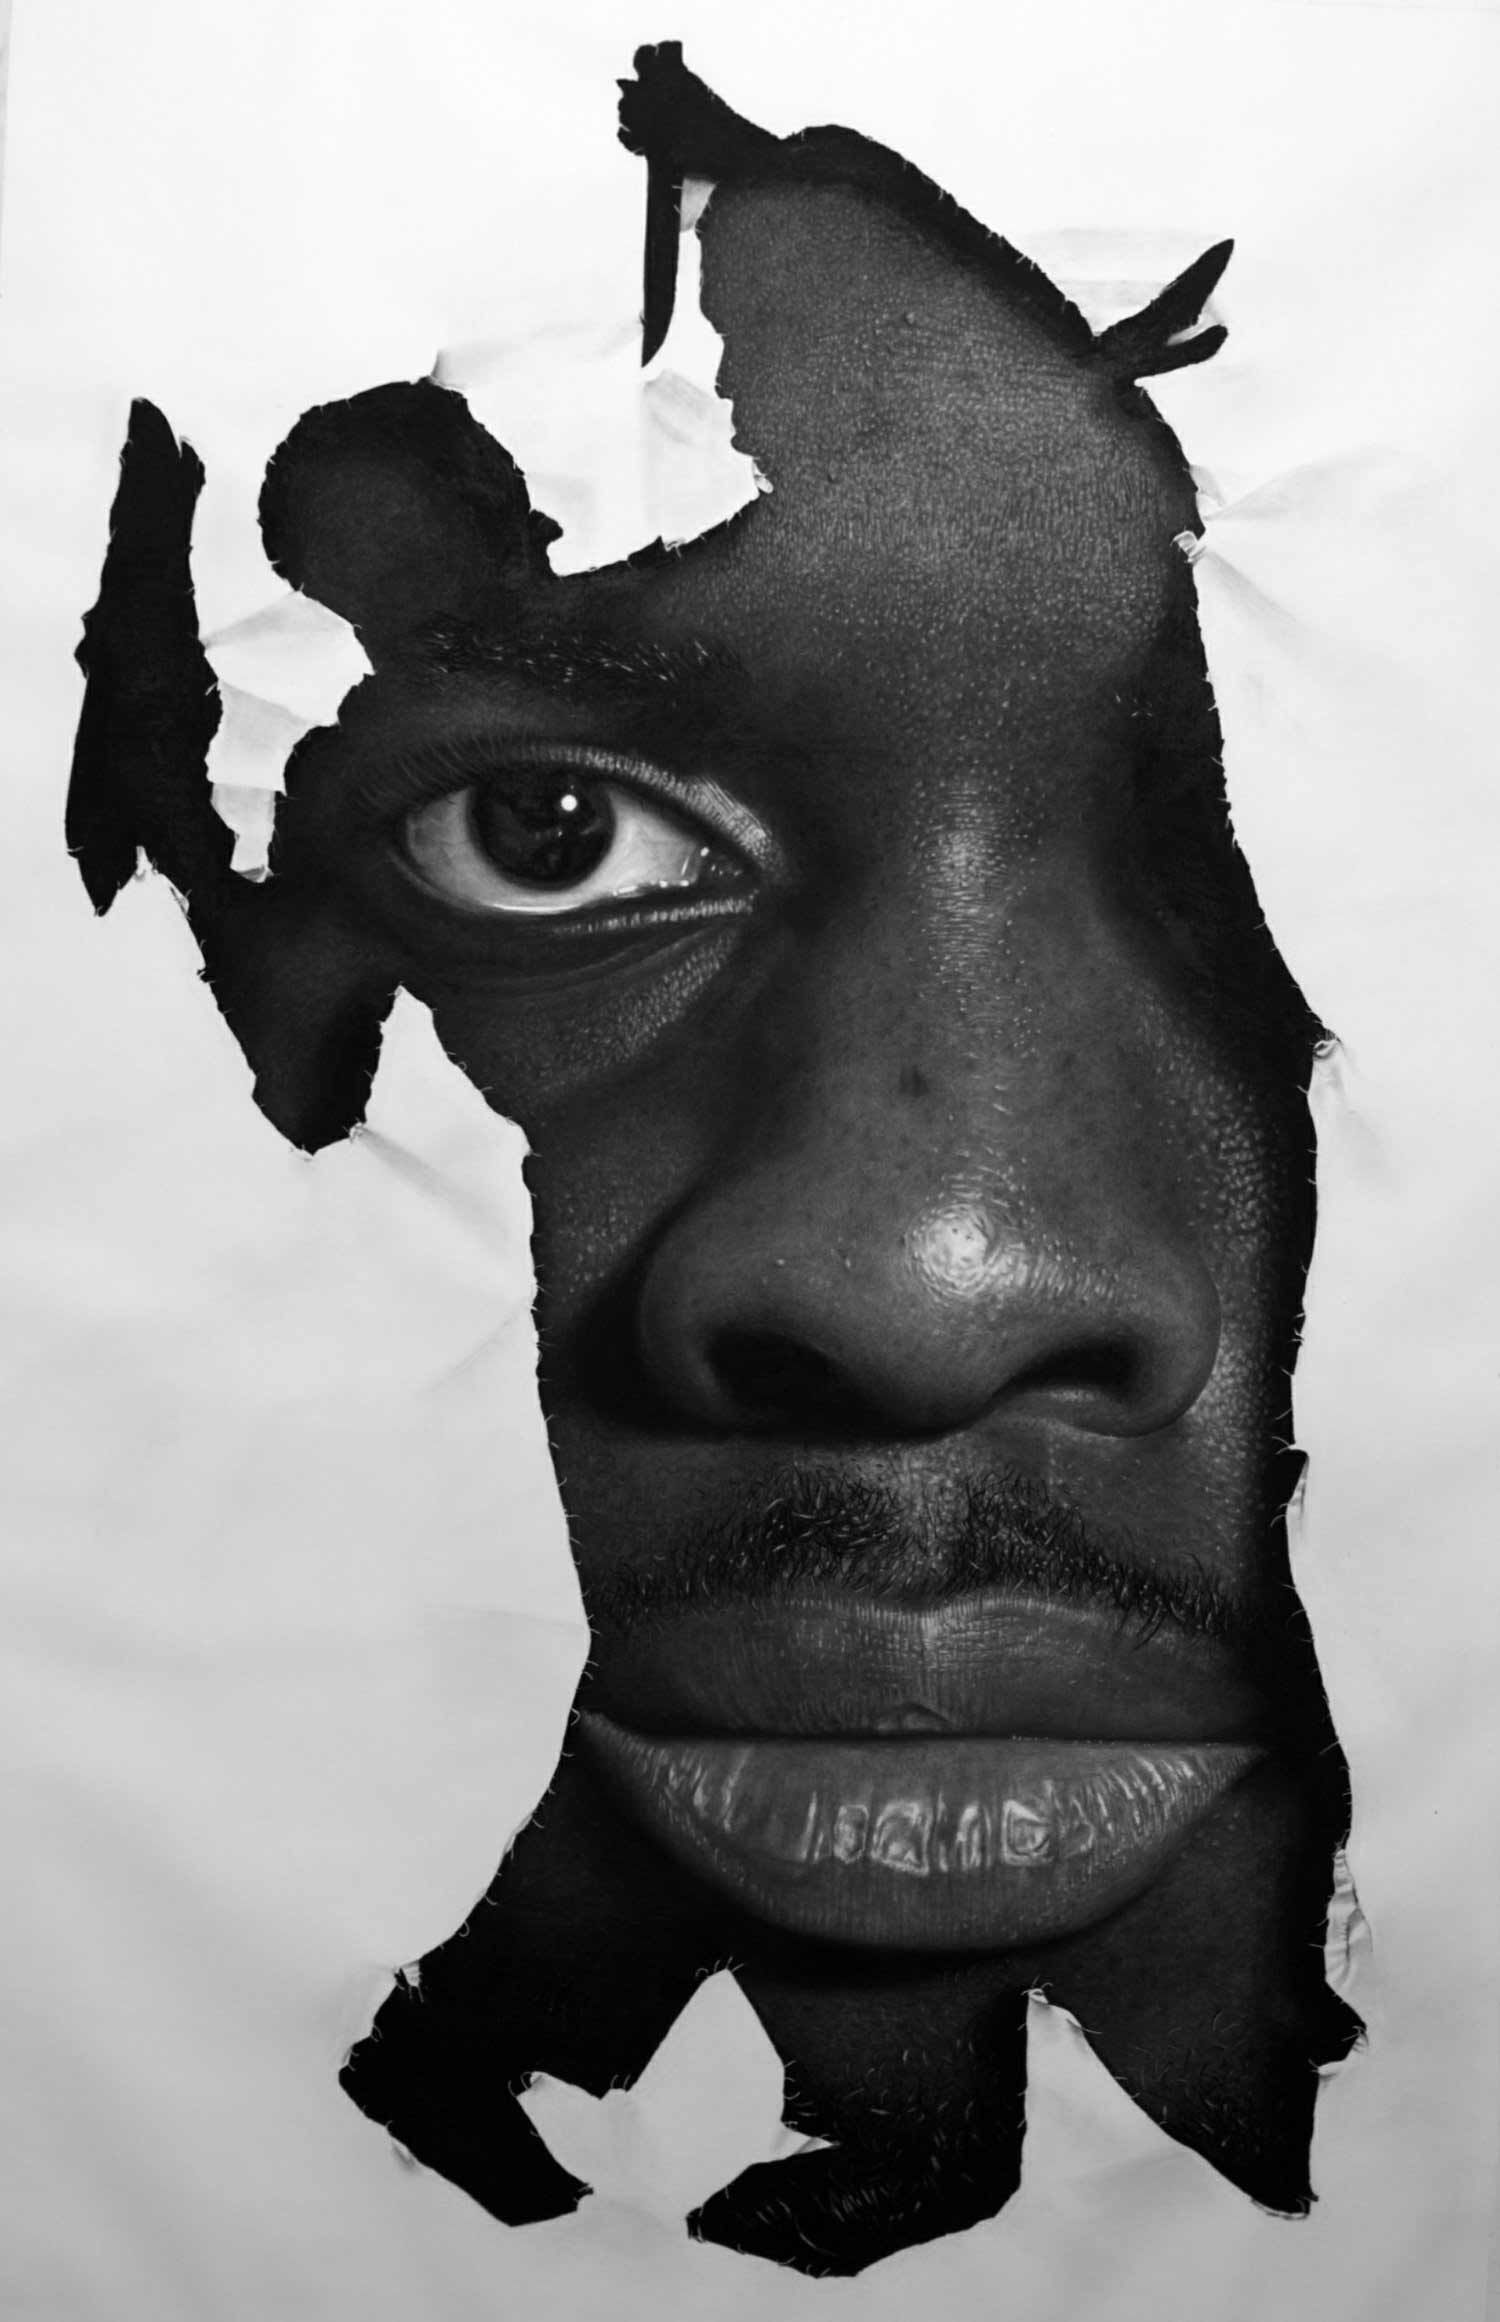 Zeichnungen: Ken Nwadiogbu Ken-Nwadiogbu_02